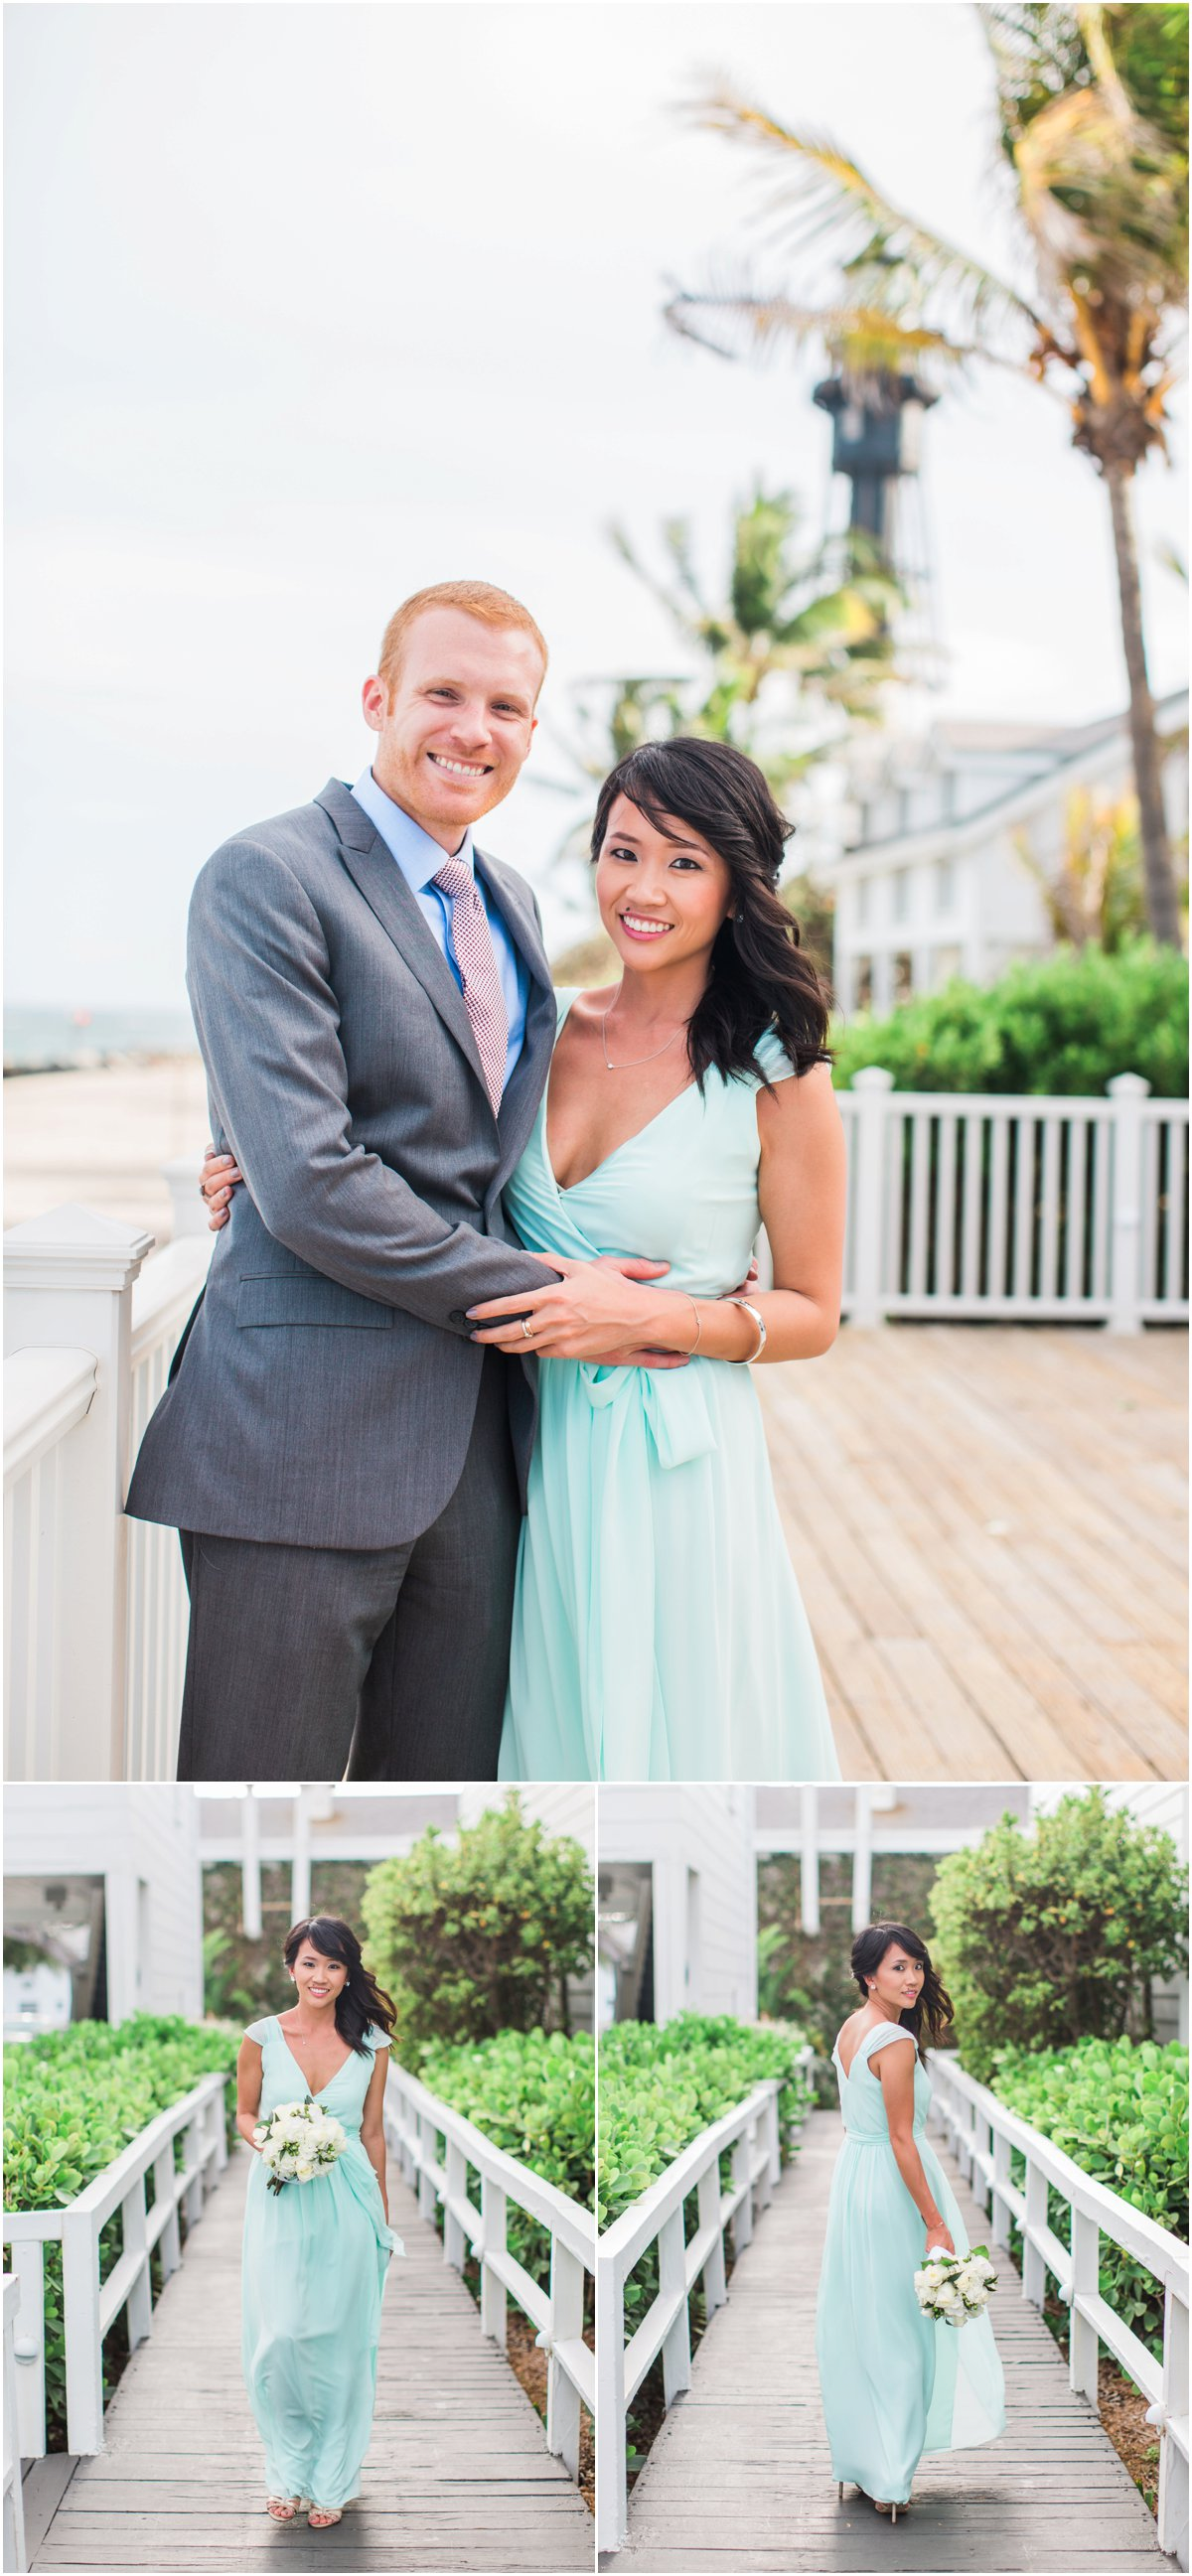 South-Florida-Wedding-Photographer-Hillsboro-lighthouse_0023